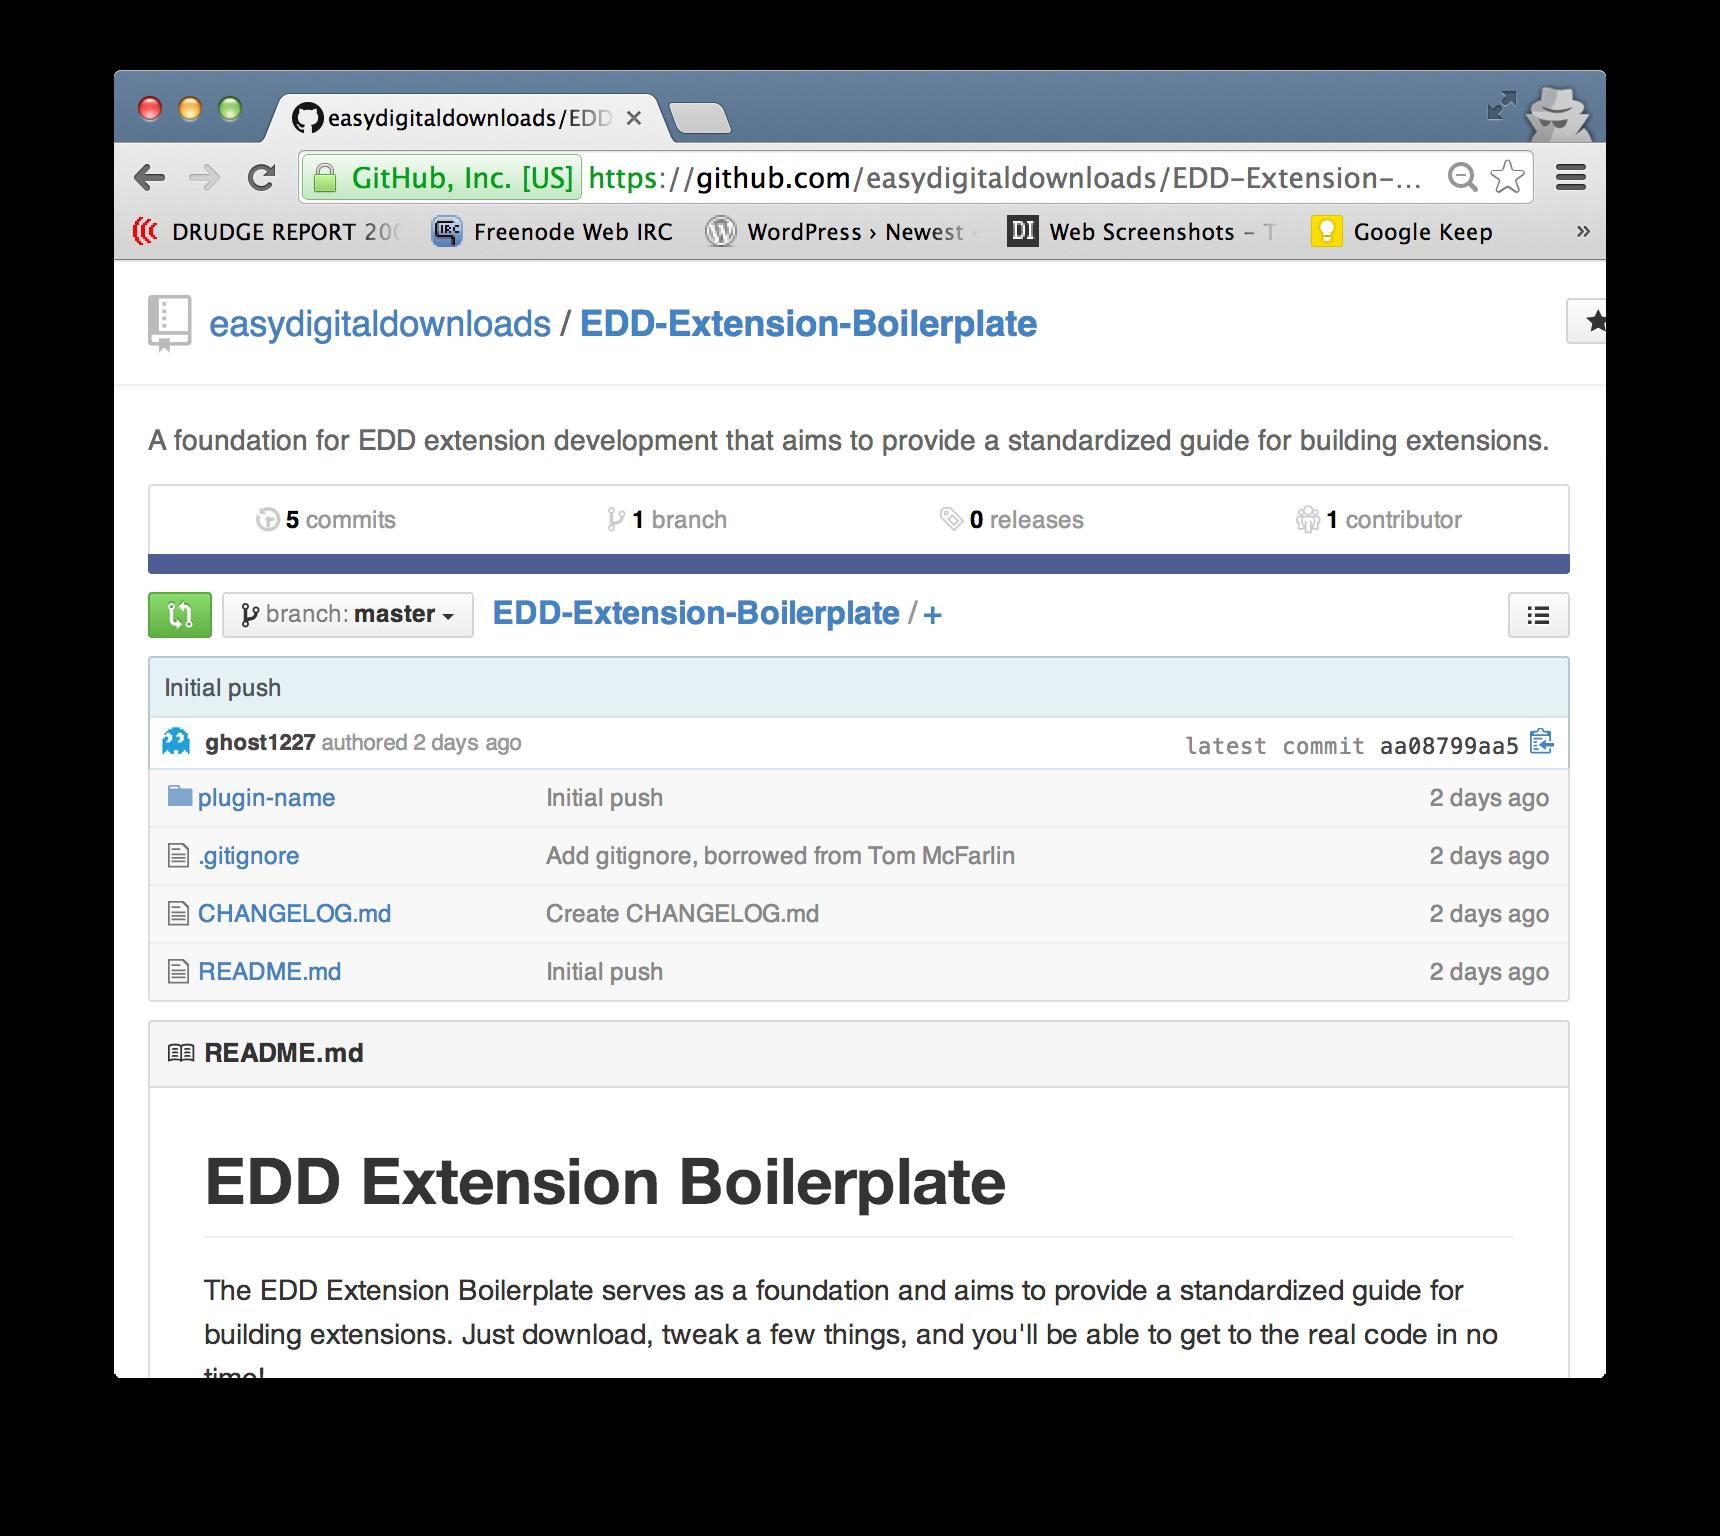 edd-extension-boilerplate